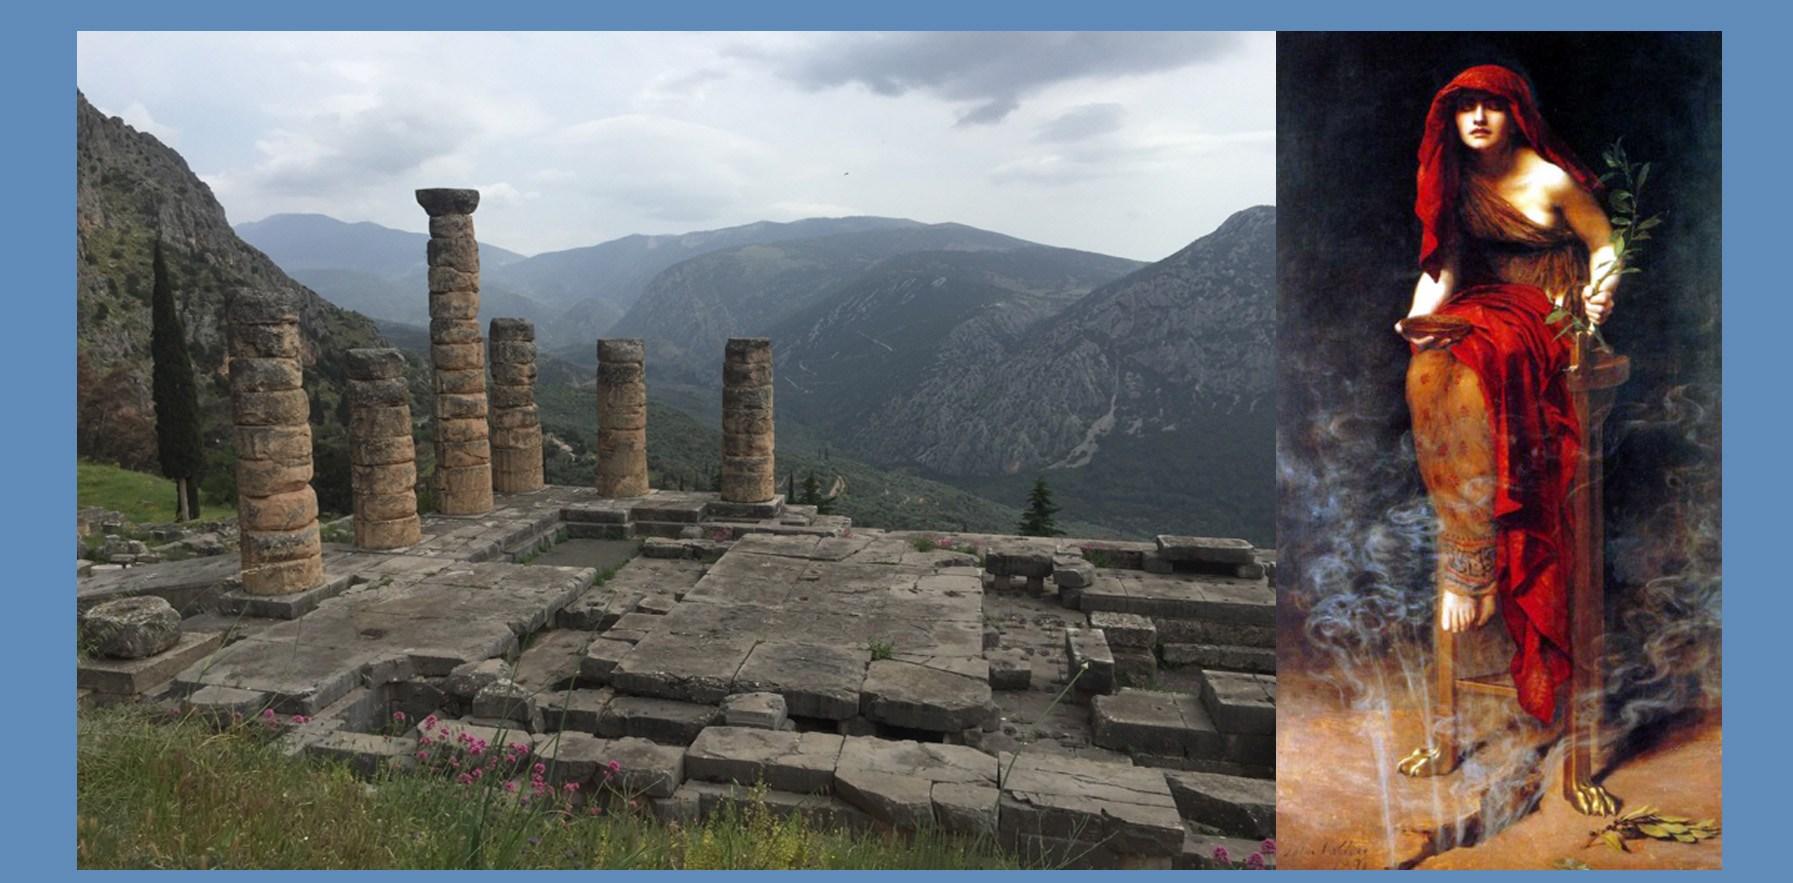 My Trip to Delphi